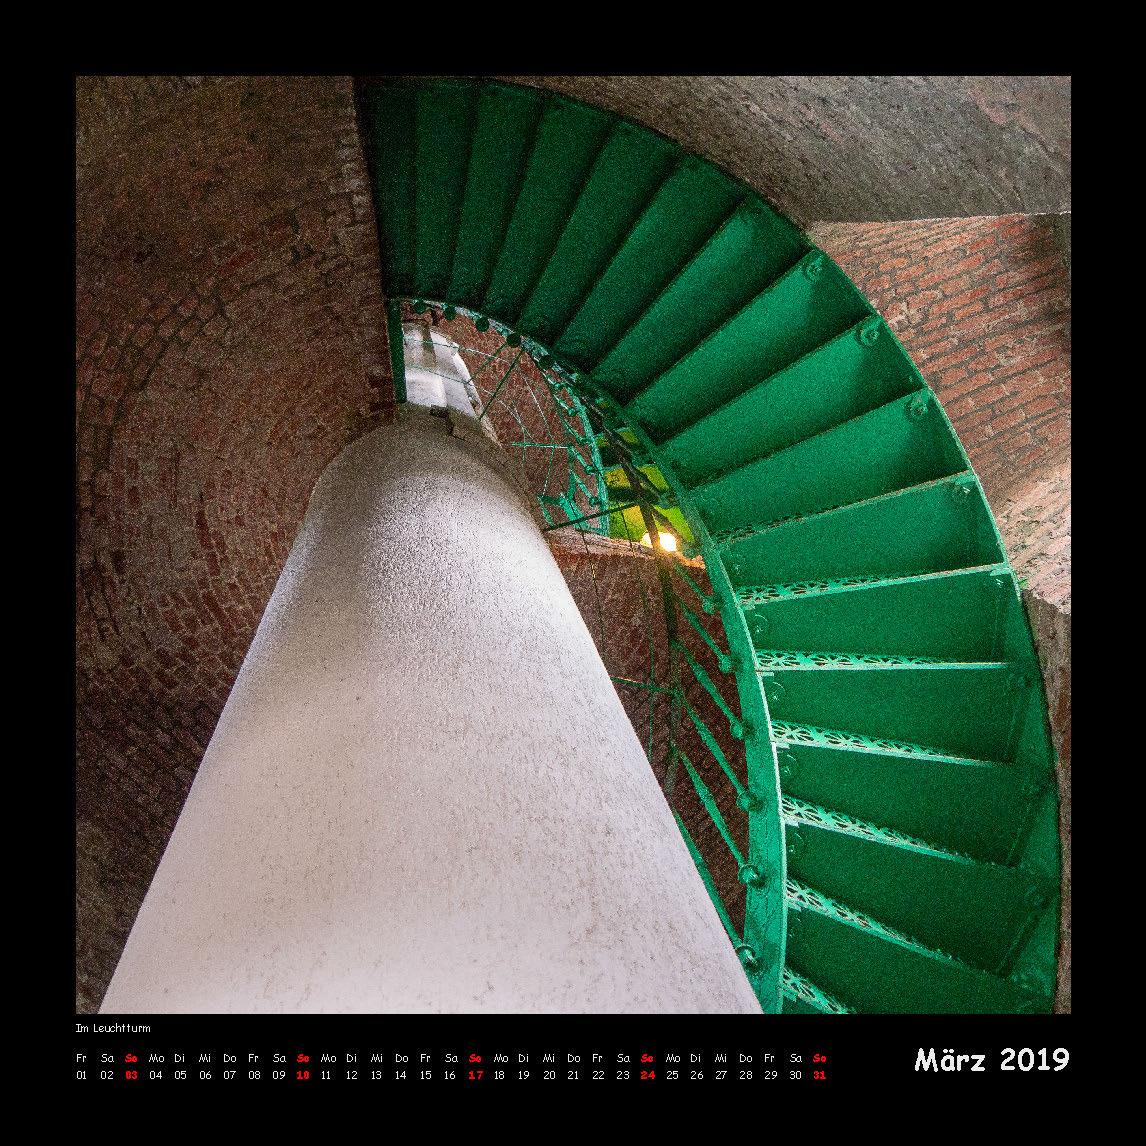 Kalender Quadraturen 2019 März (c)decoDesign-peters